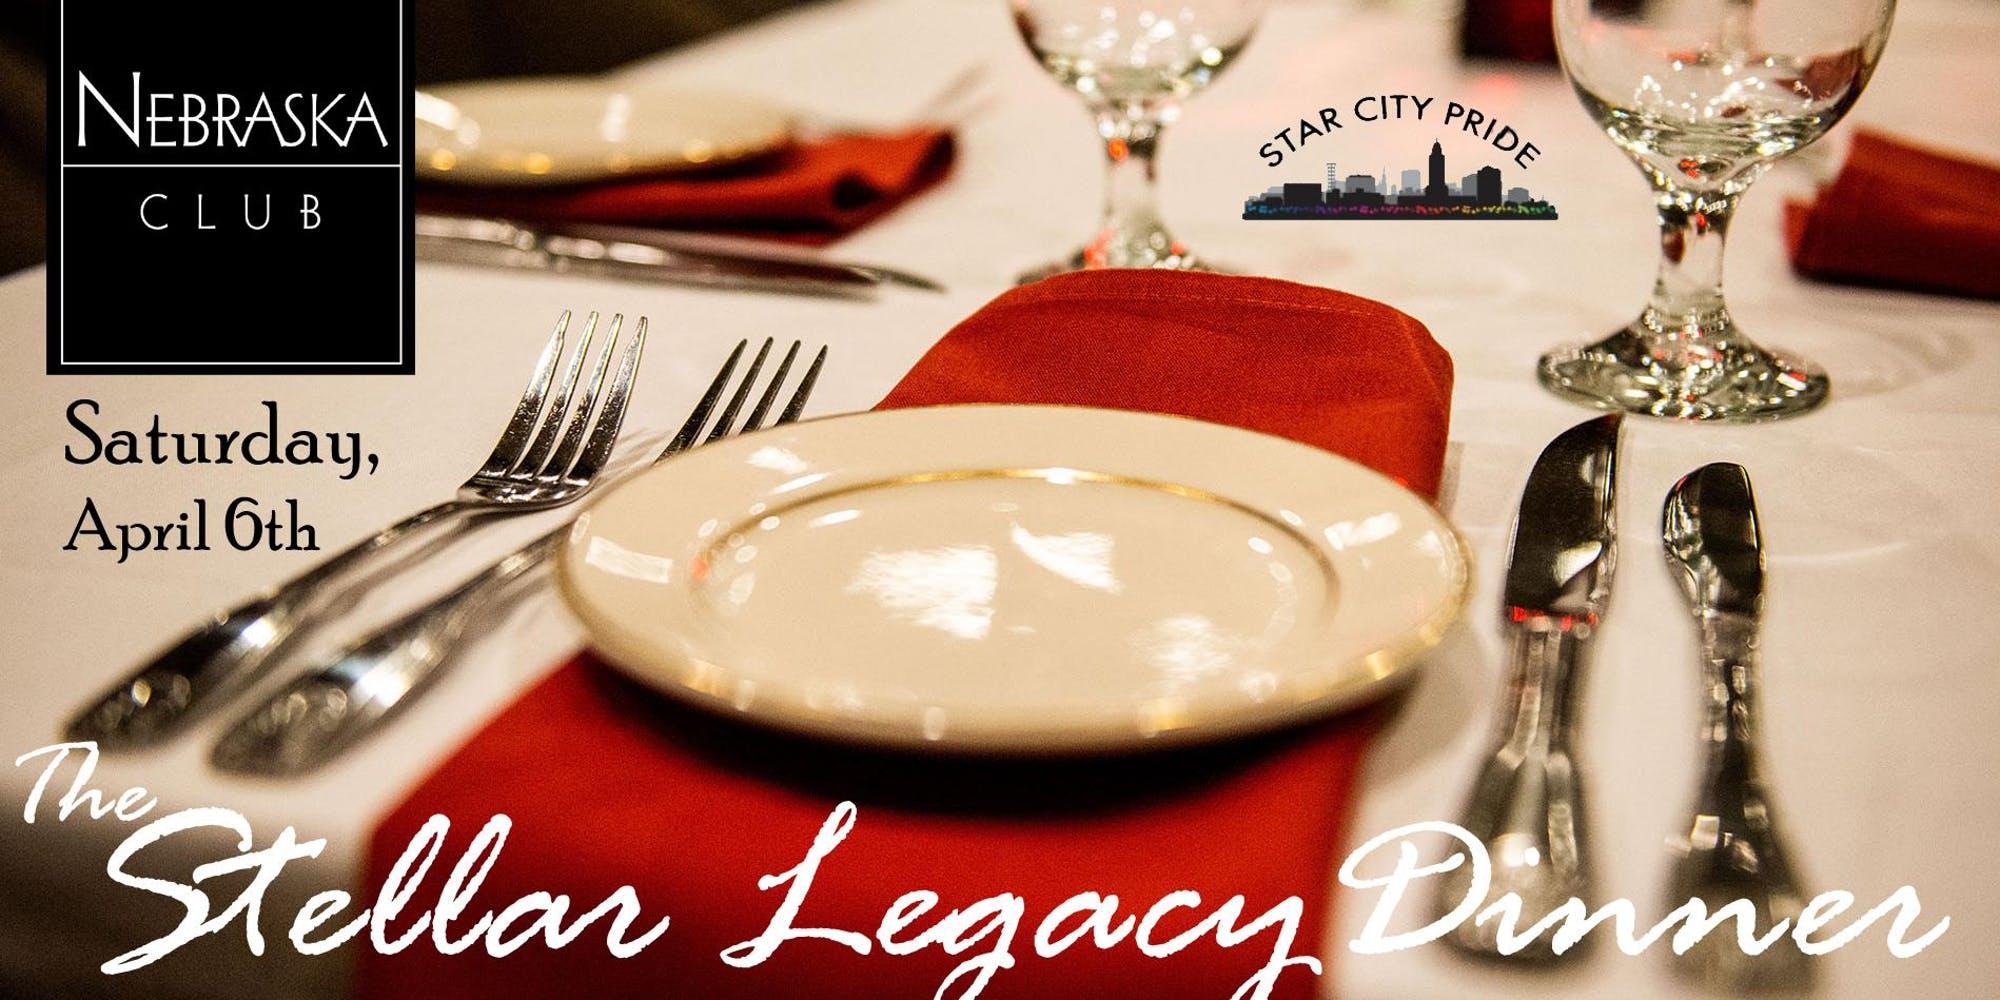 The Stellar Legacy Dinner